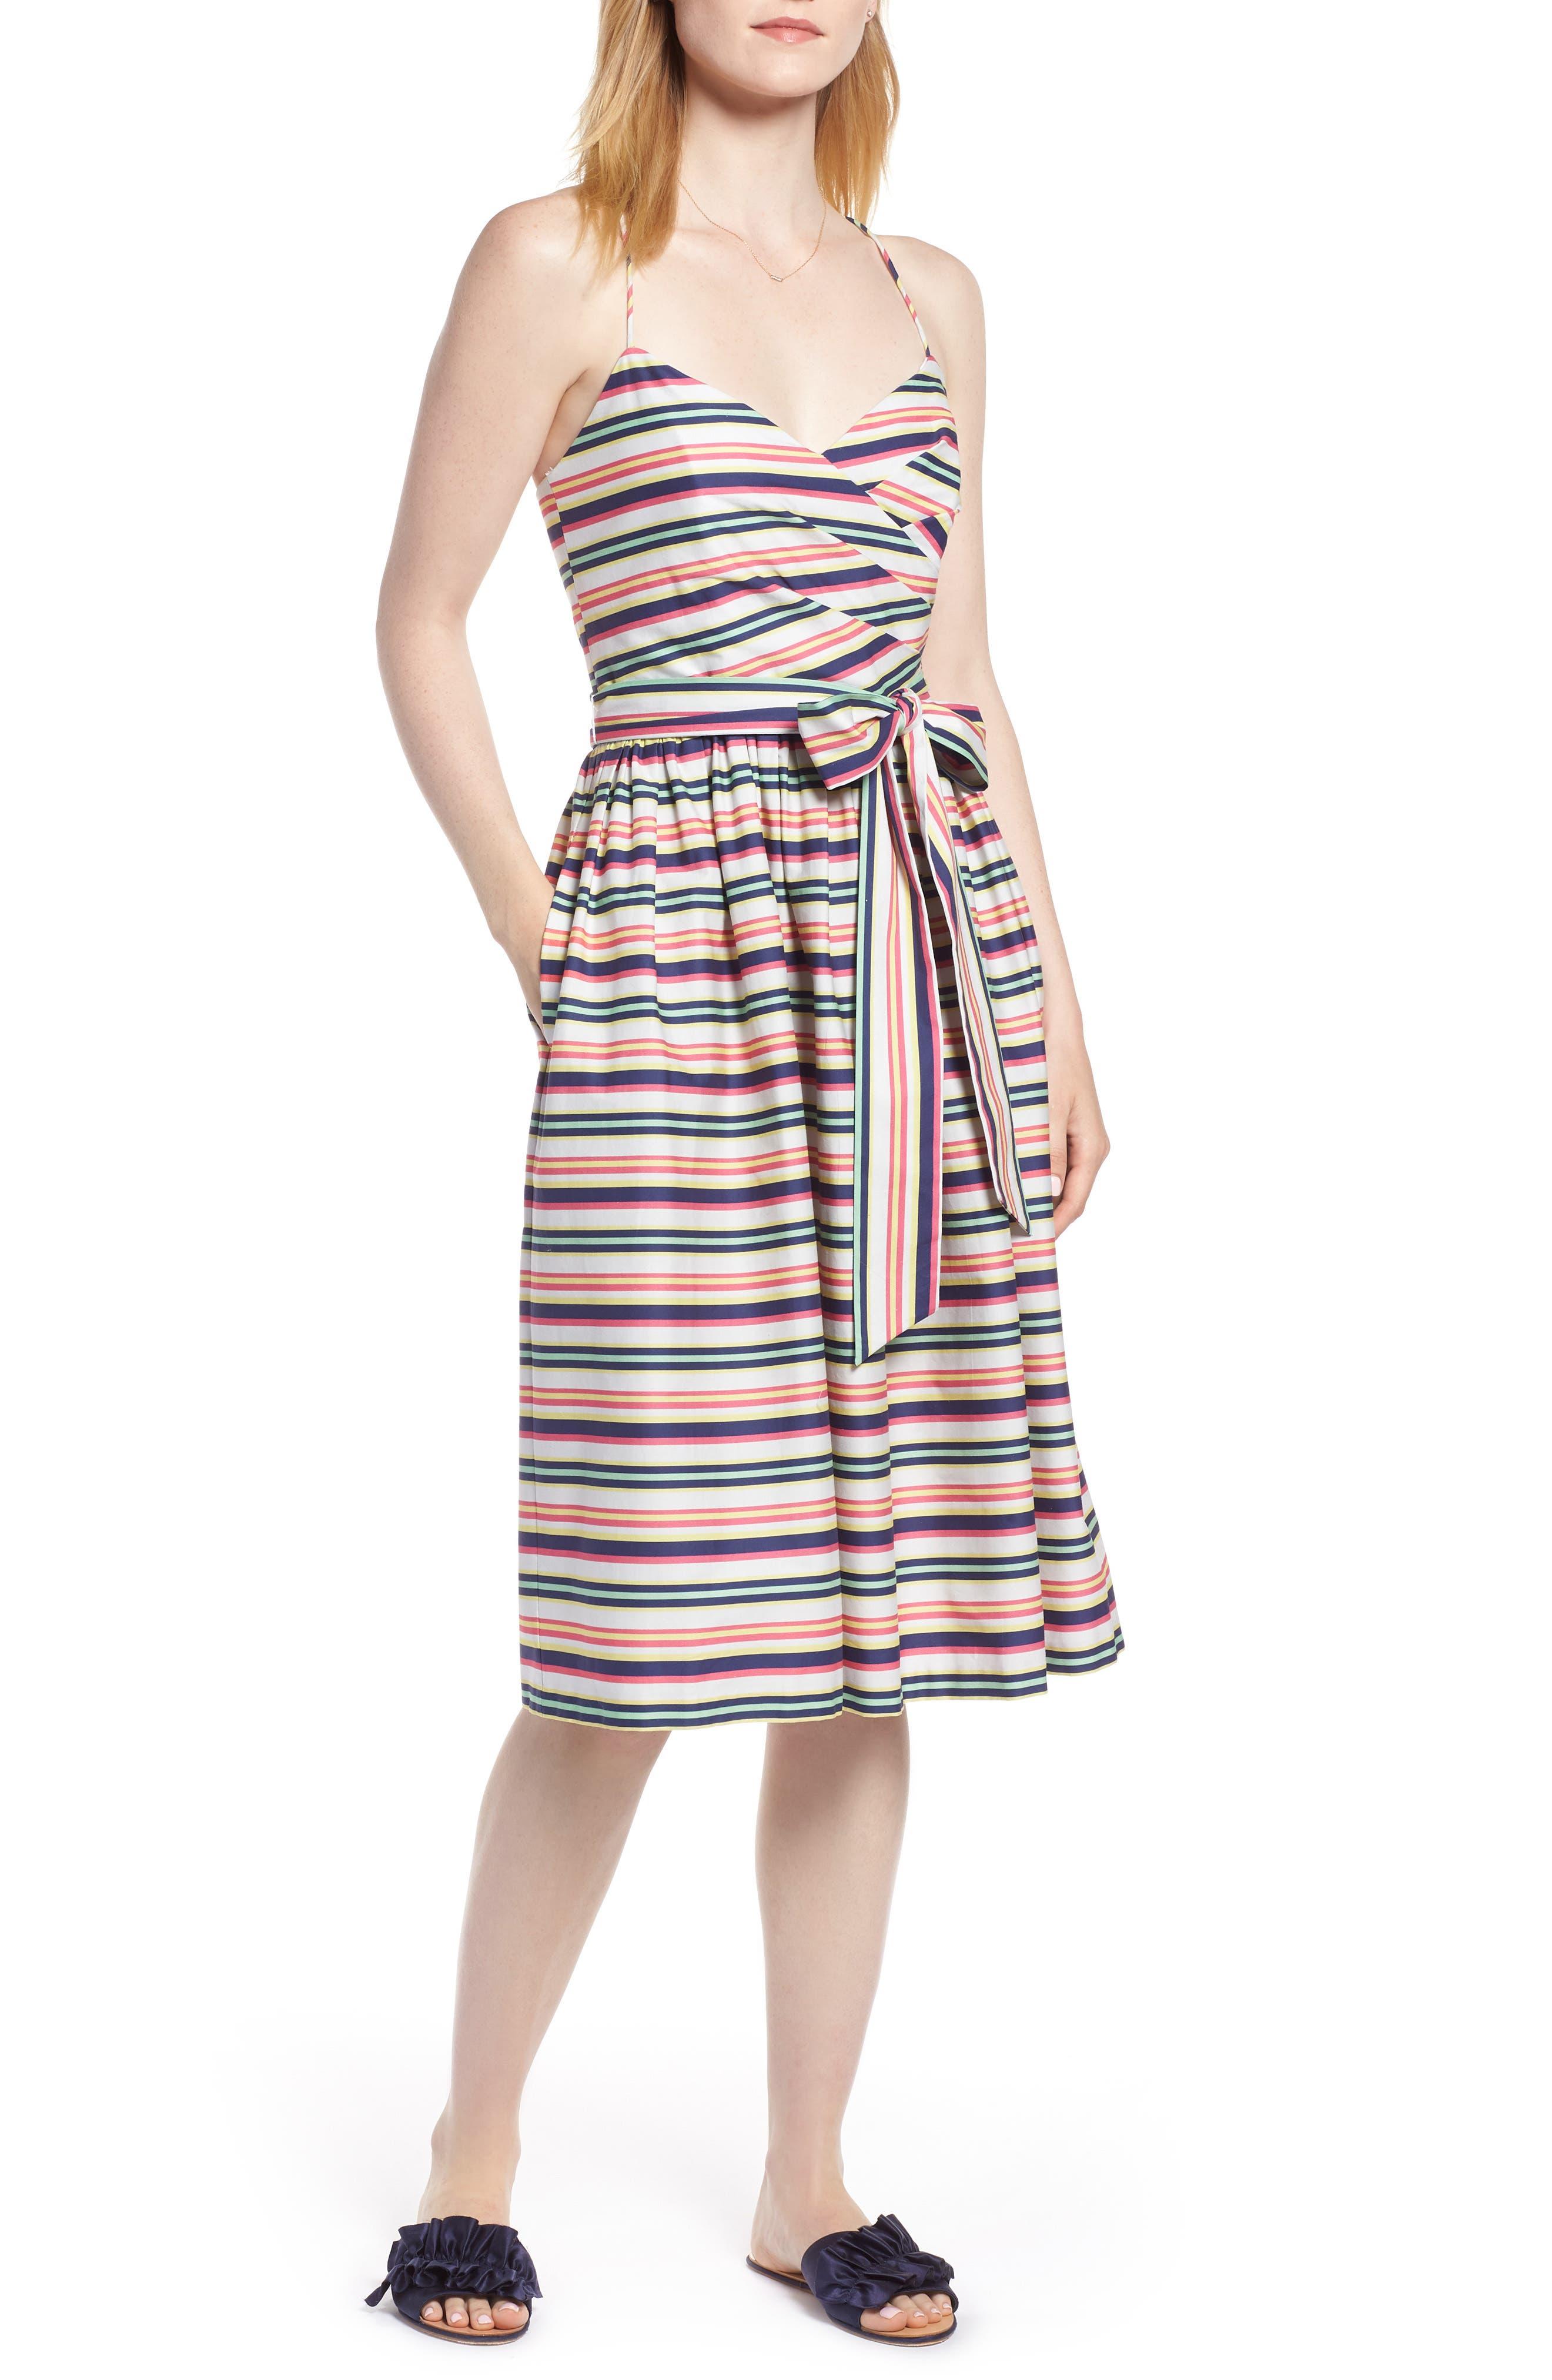 Stripe Strappy Cotton Dress,                             Main thumbnail 1, color,                             NAVY PINK COMBO STRIPE